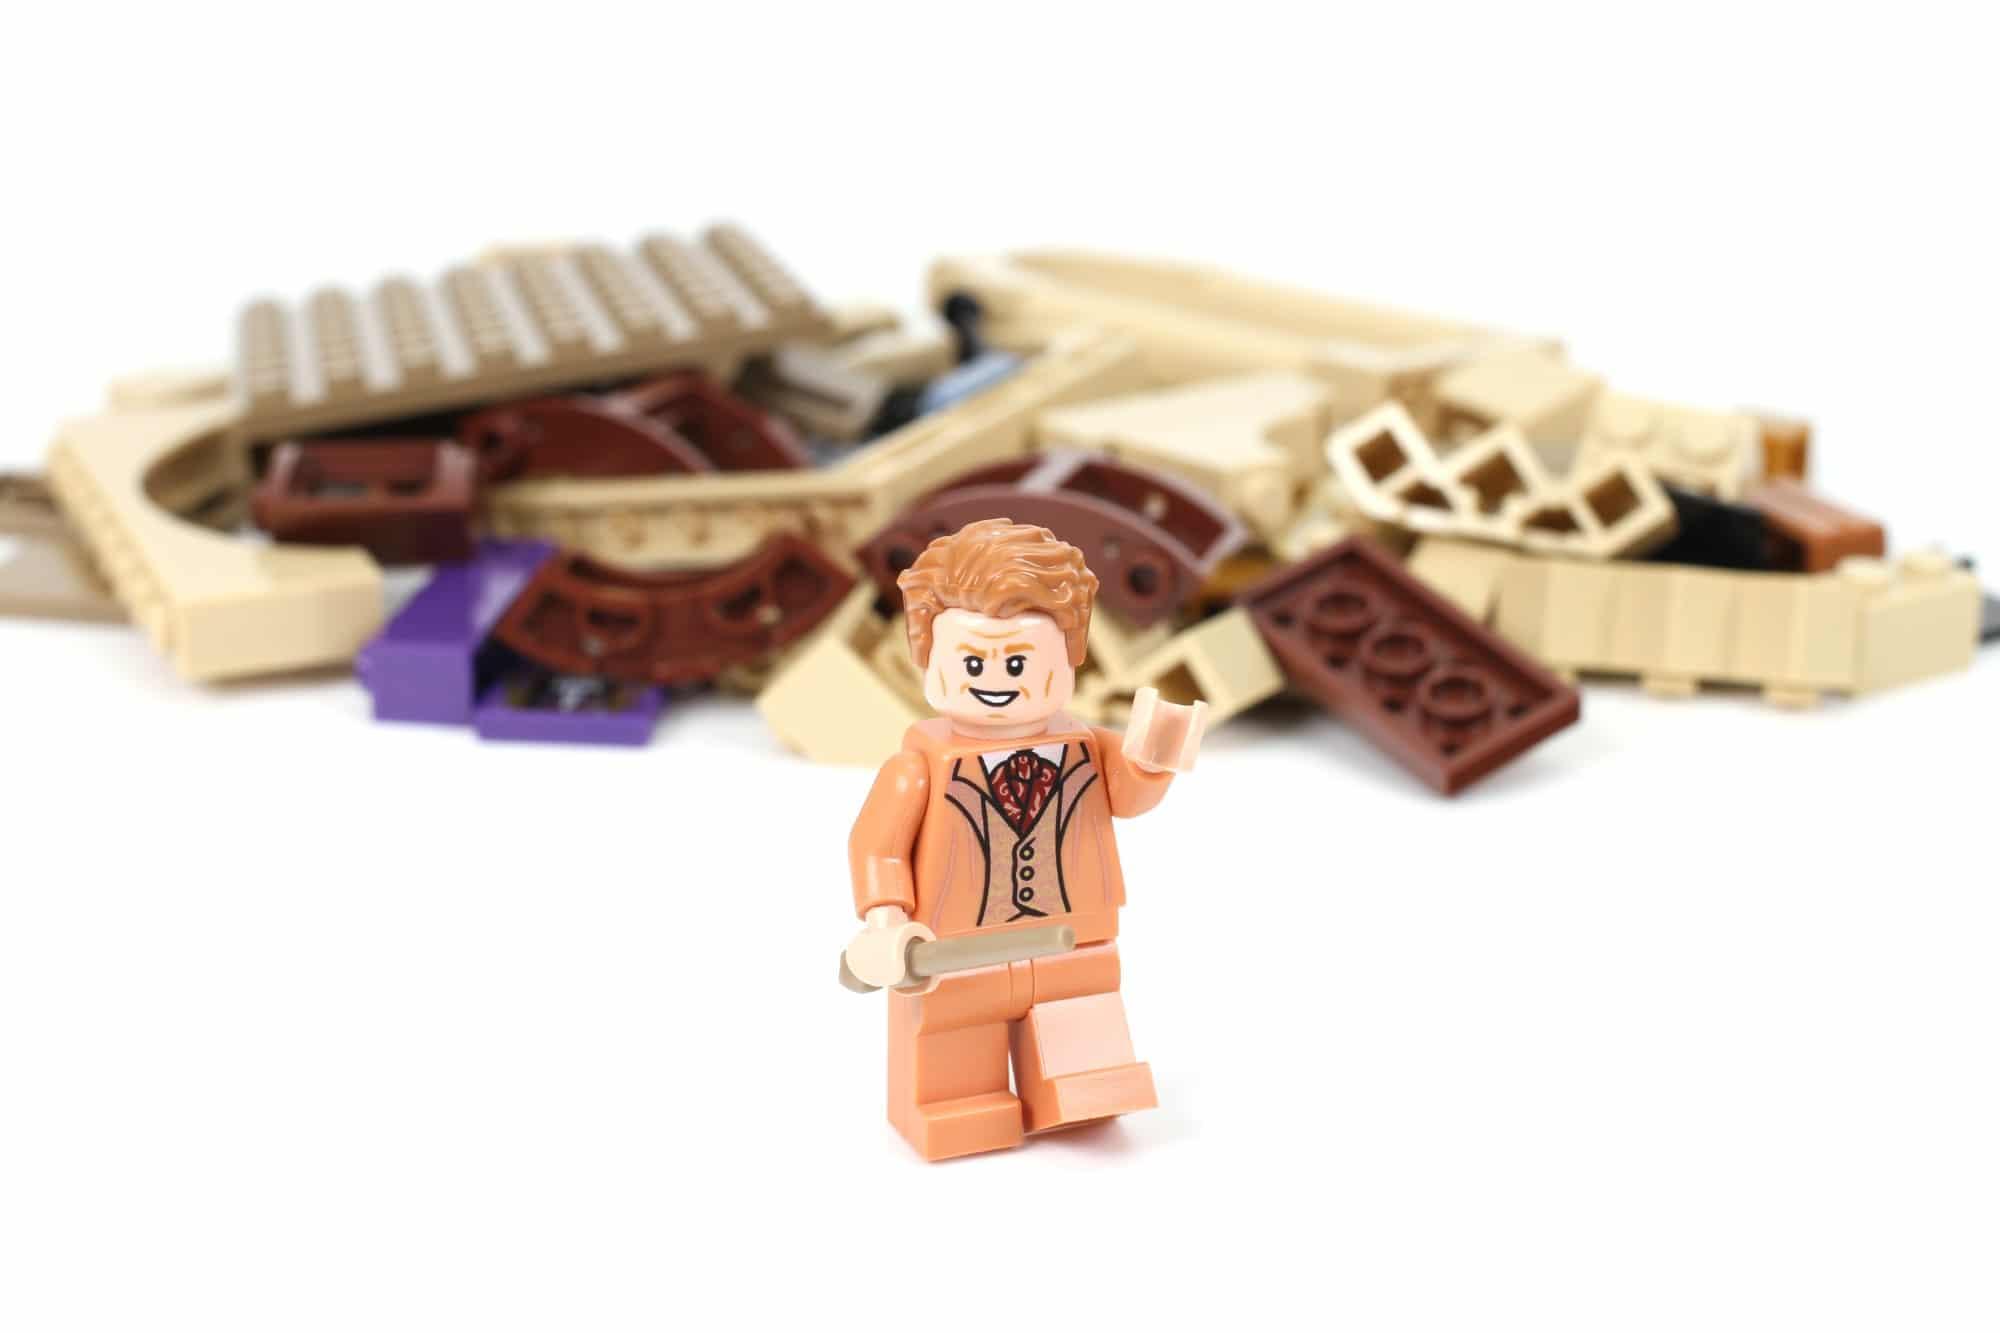 LEGO Harry Potter 76389 Hogwarts Kammer Des Schreckens Schritt 3 1